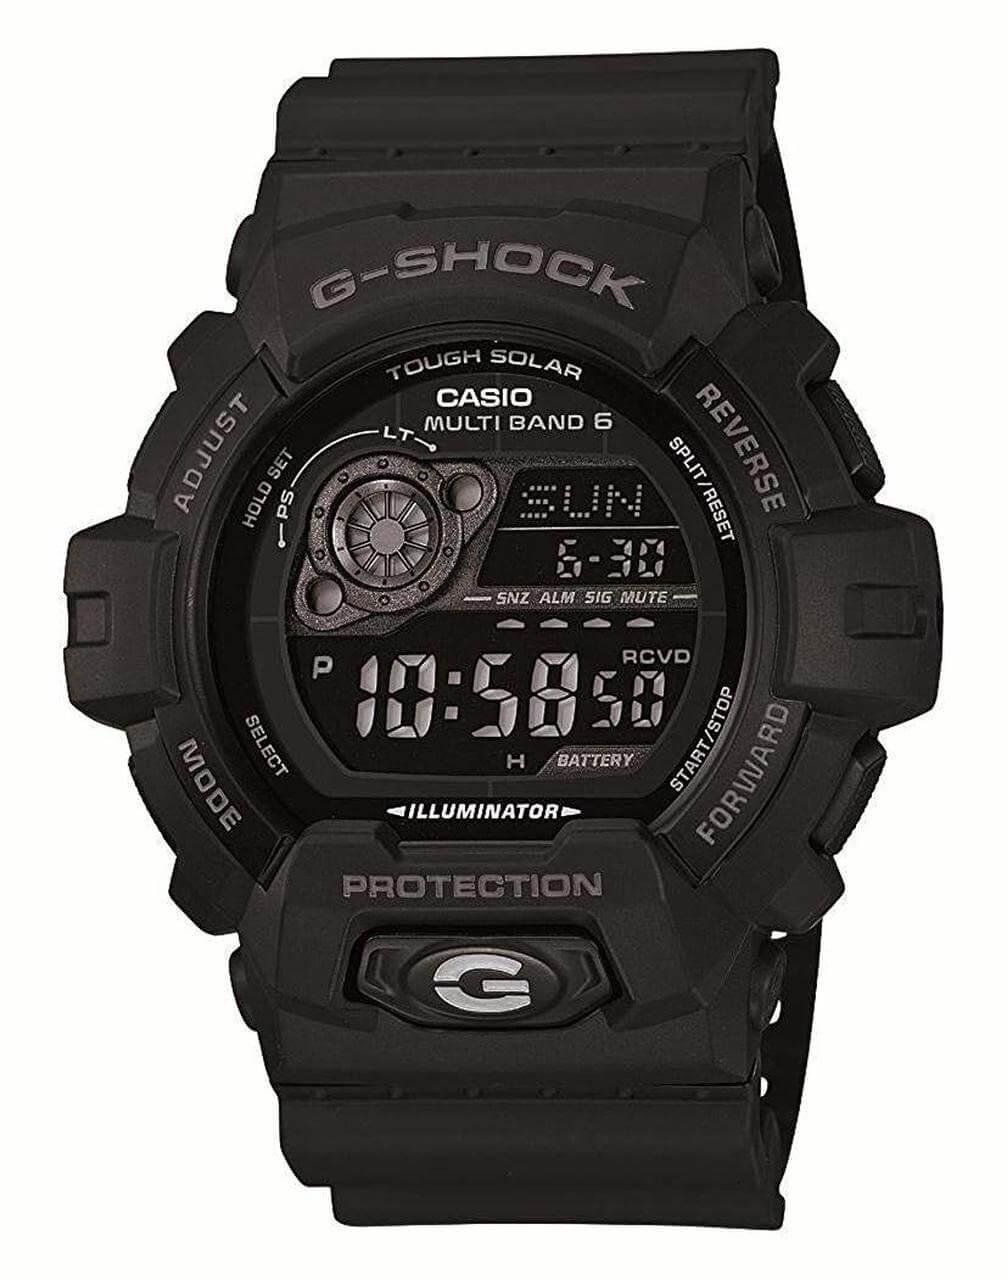 G-Shock GW-8900A-1JF Atomic Multiband 6